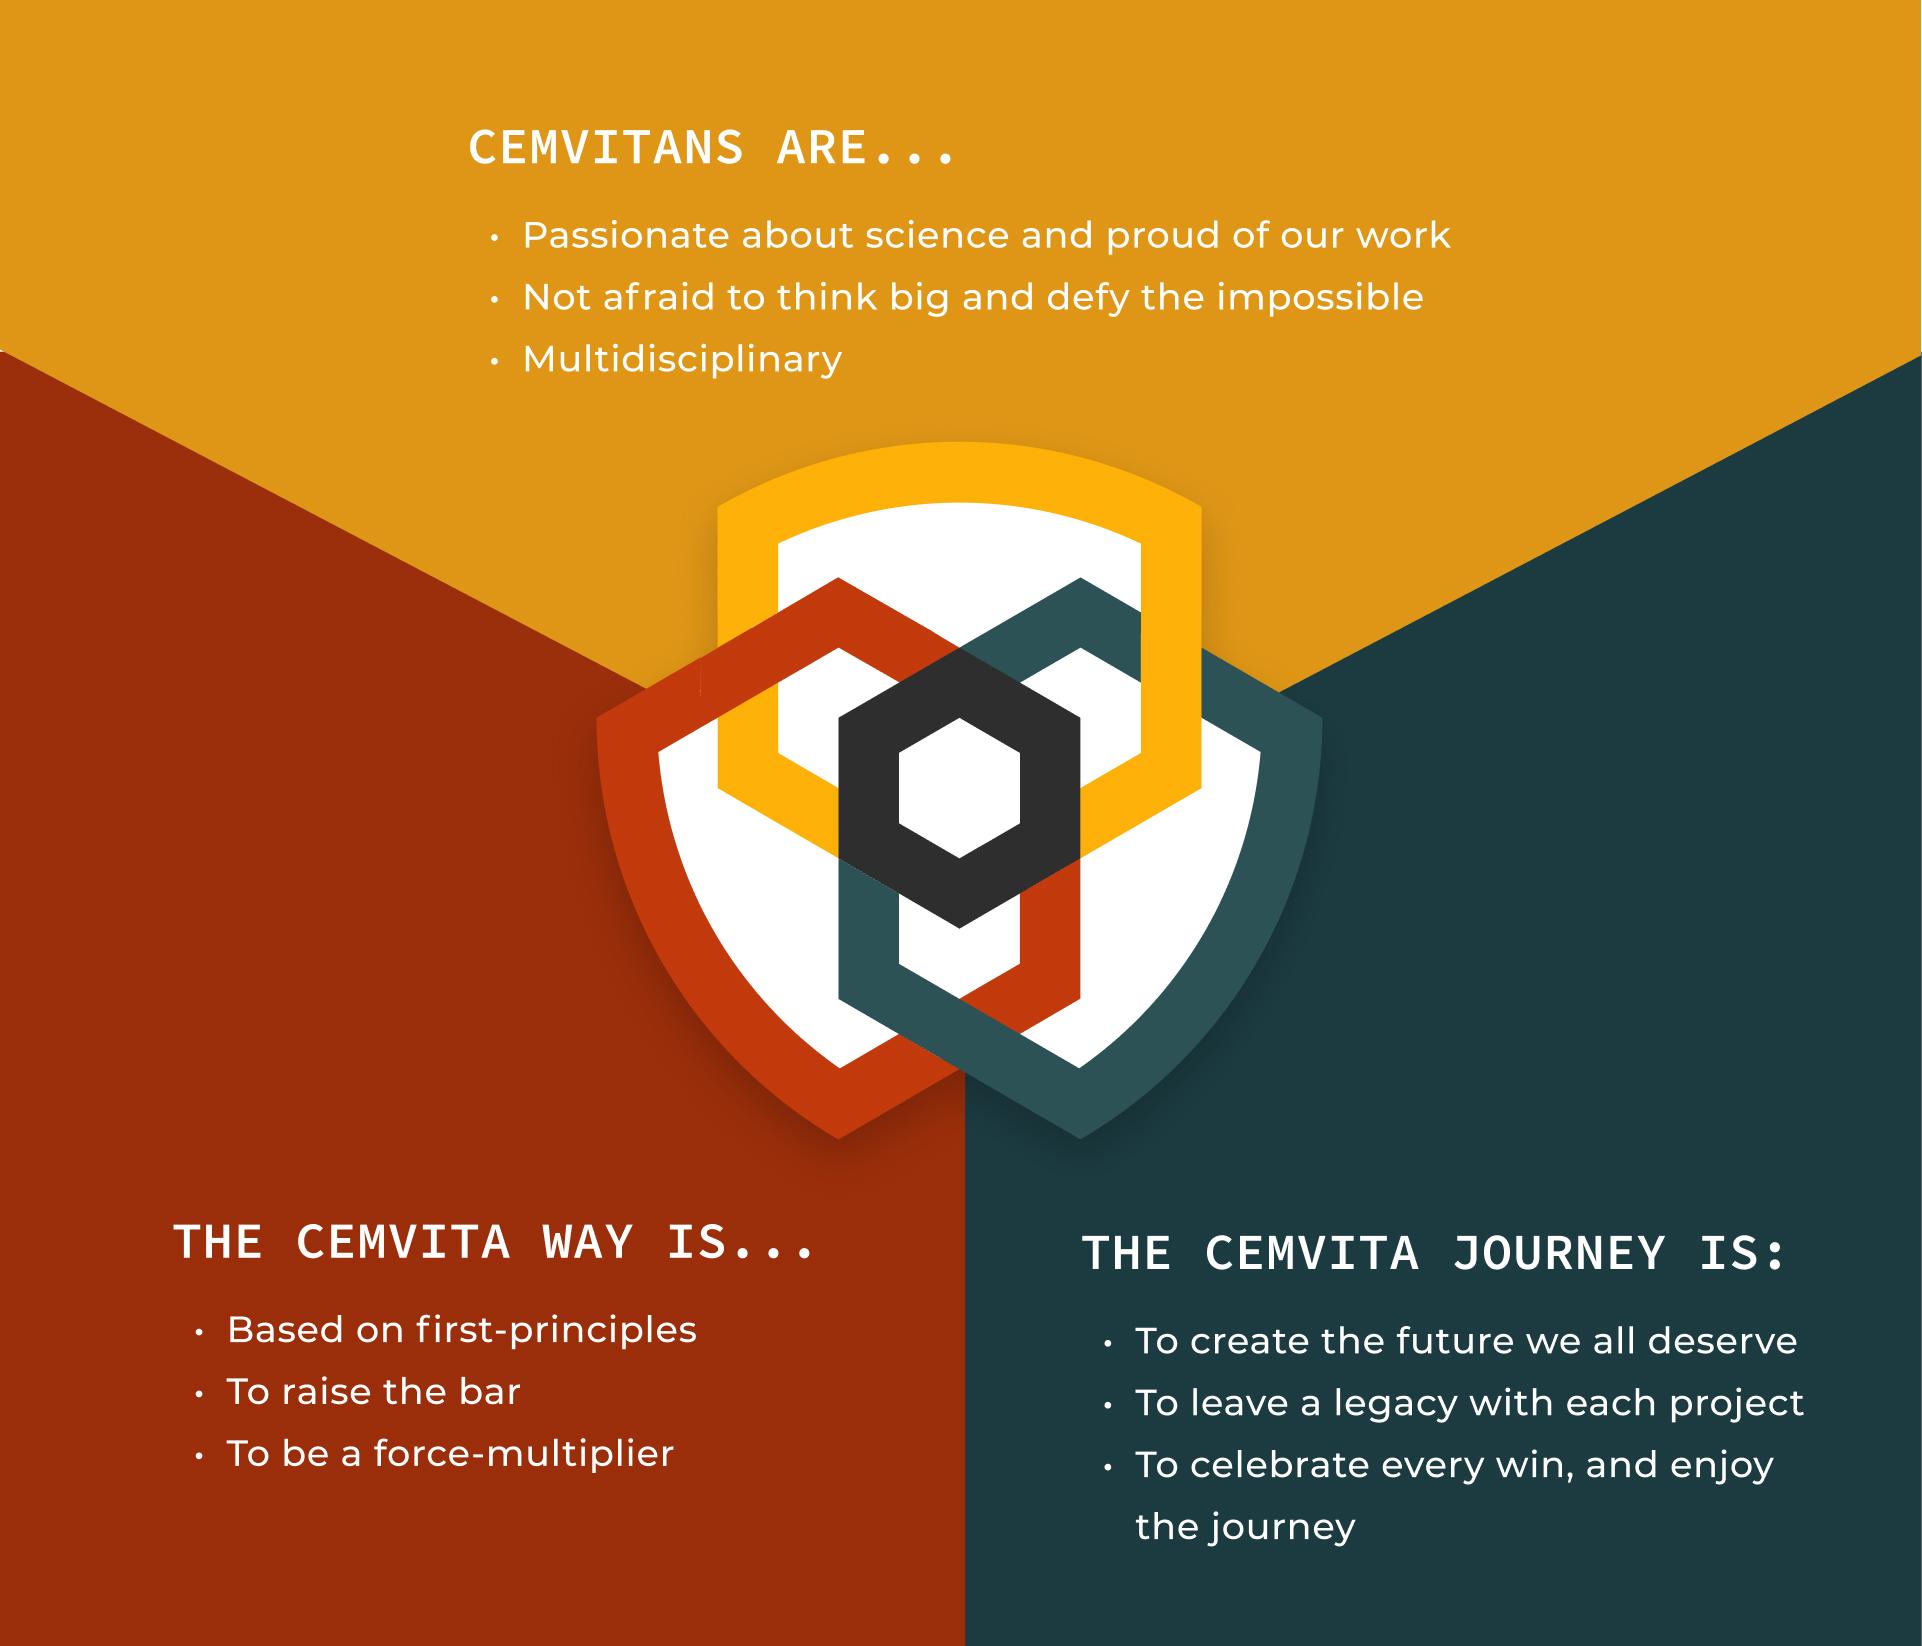 core values with cemvita logo mark in center